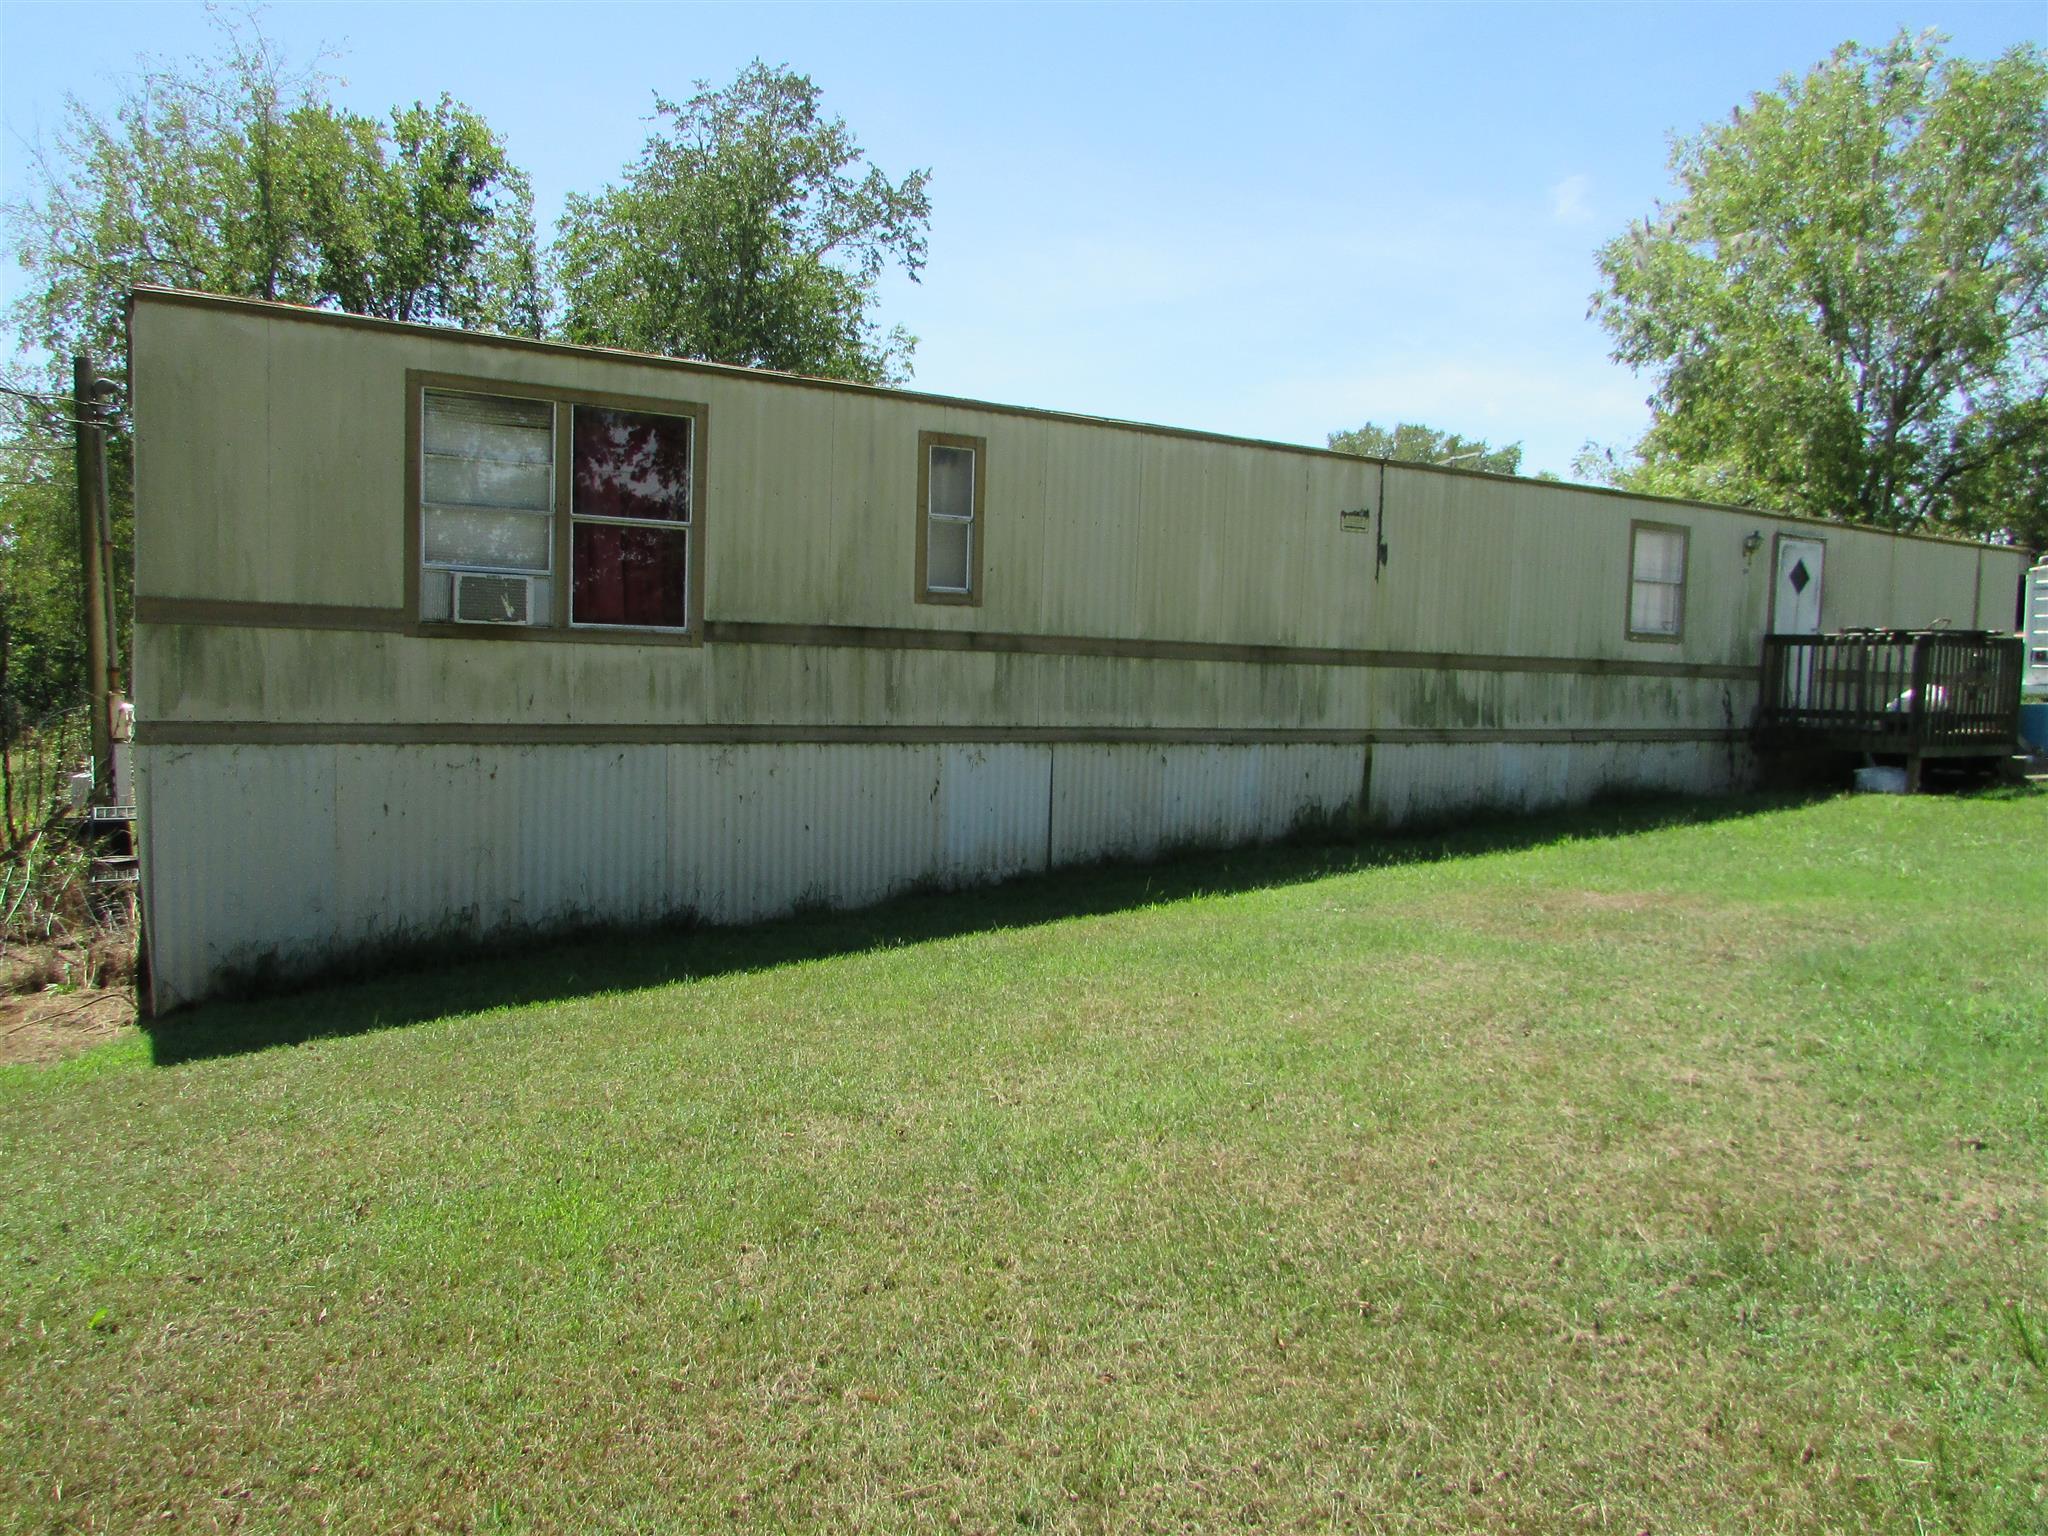 3375 Williamsport Pike, Williamsport, TN 38487 - Williamsport, TN real estate listing